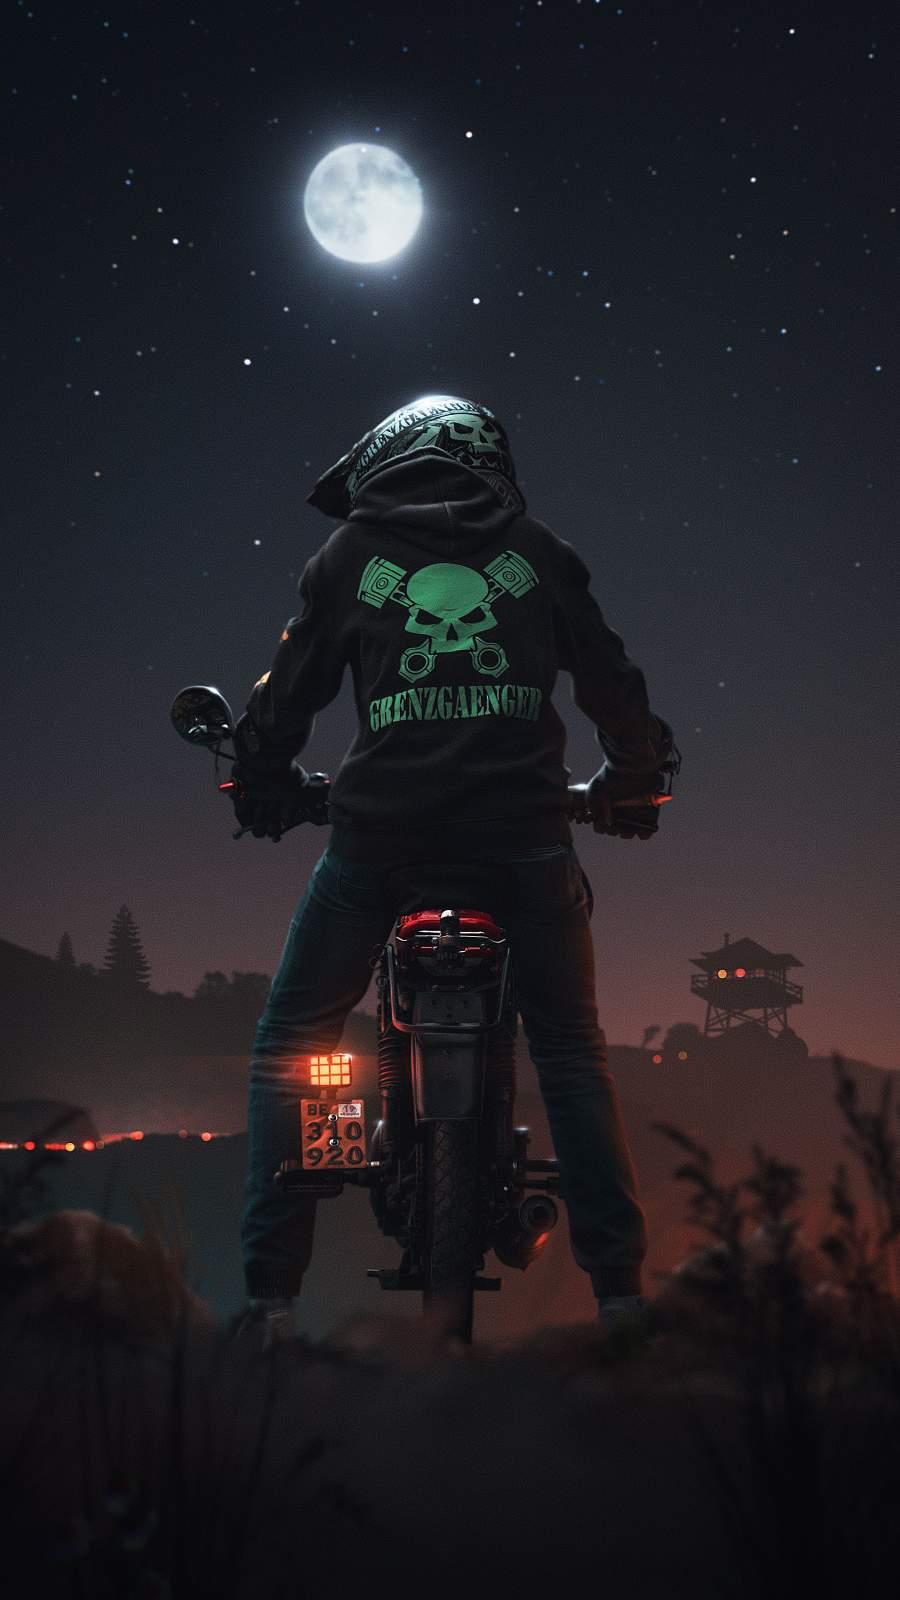 Midnight Biker iPhone Wallpaper